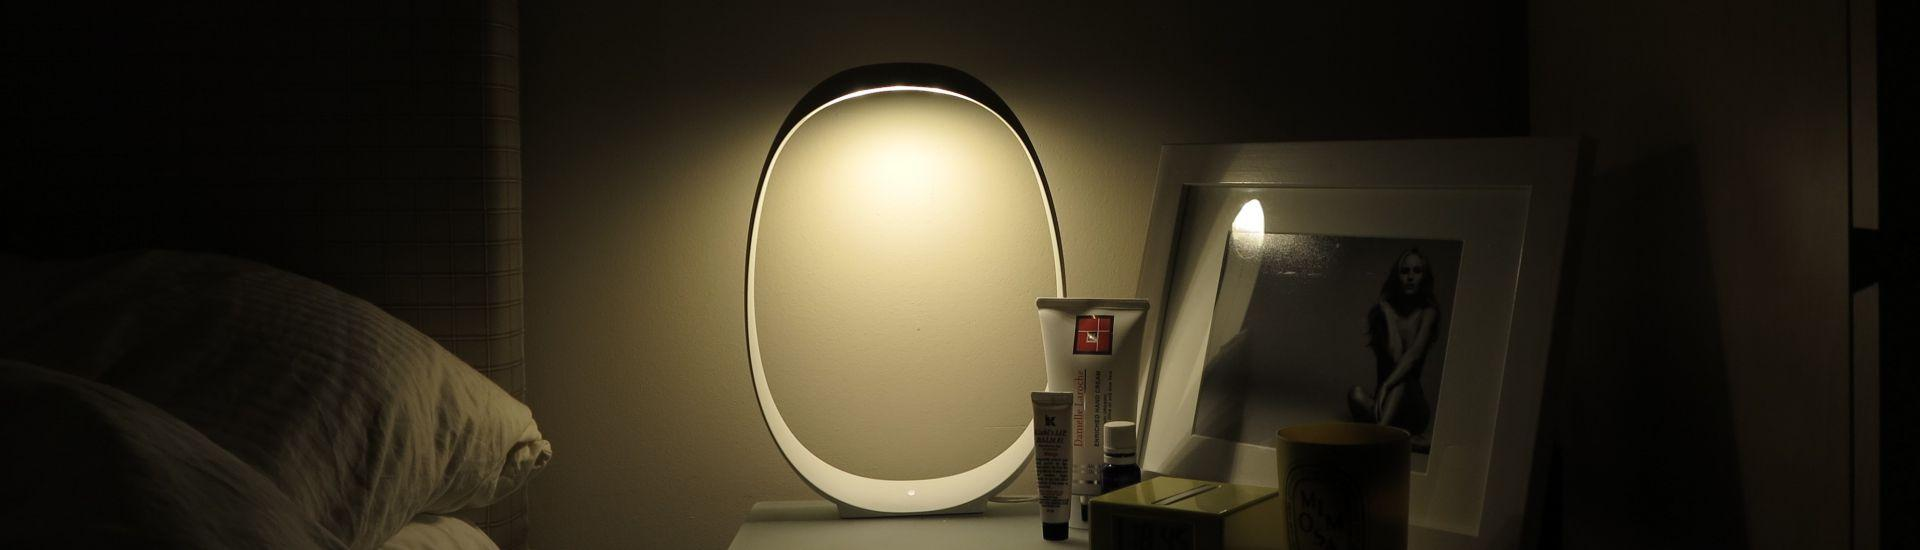 Anisha Lampe de table Grand 46cm LED 4,5w 3000K avec dimmer blanc